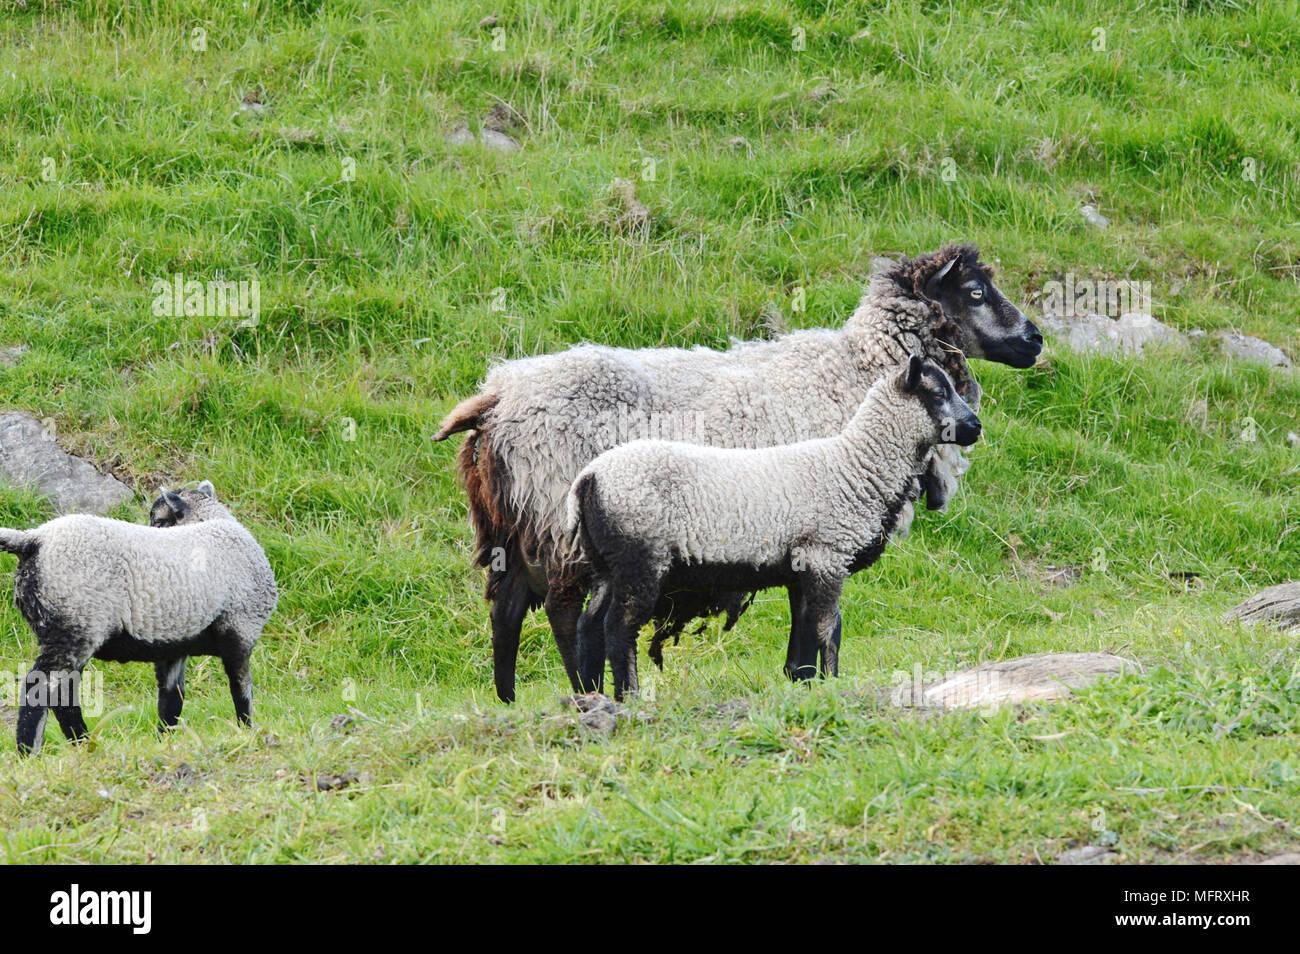 Native Shetland Sheep and lambs on a croft in Shetland - Stock Image